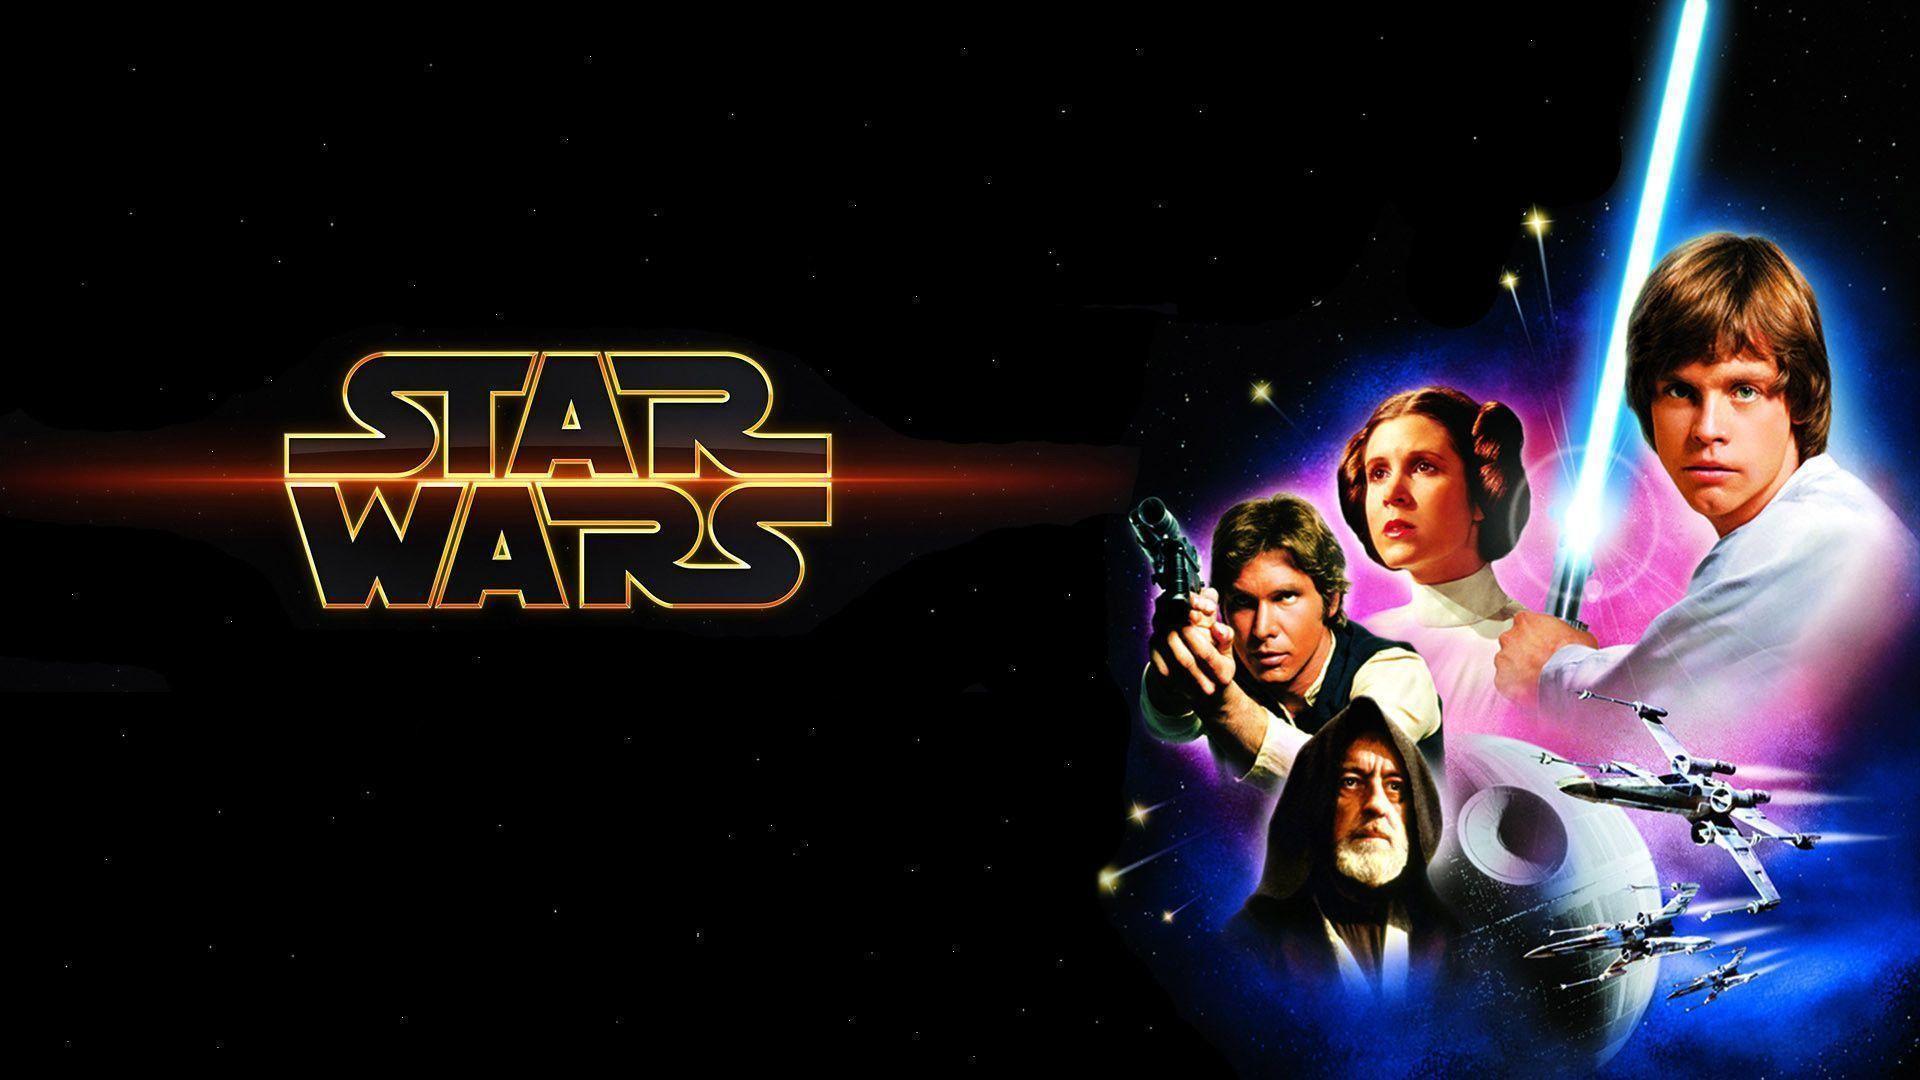 Star Wars Episode 4 Wallpaper Wallpapertag